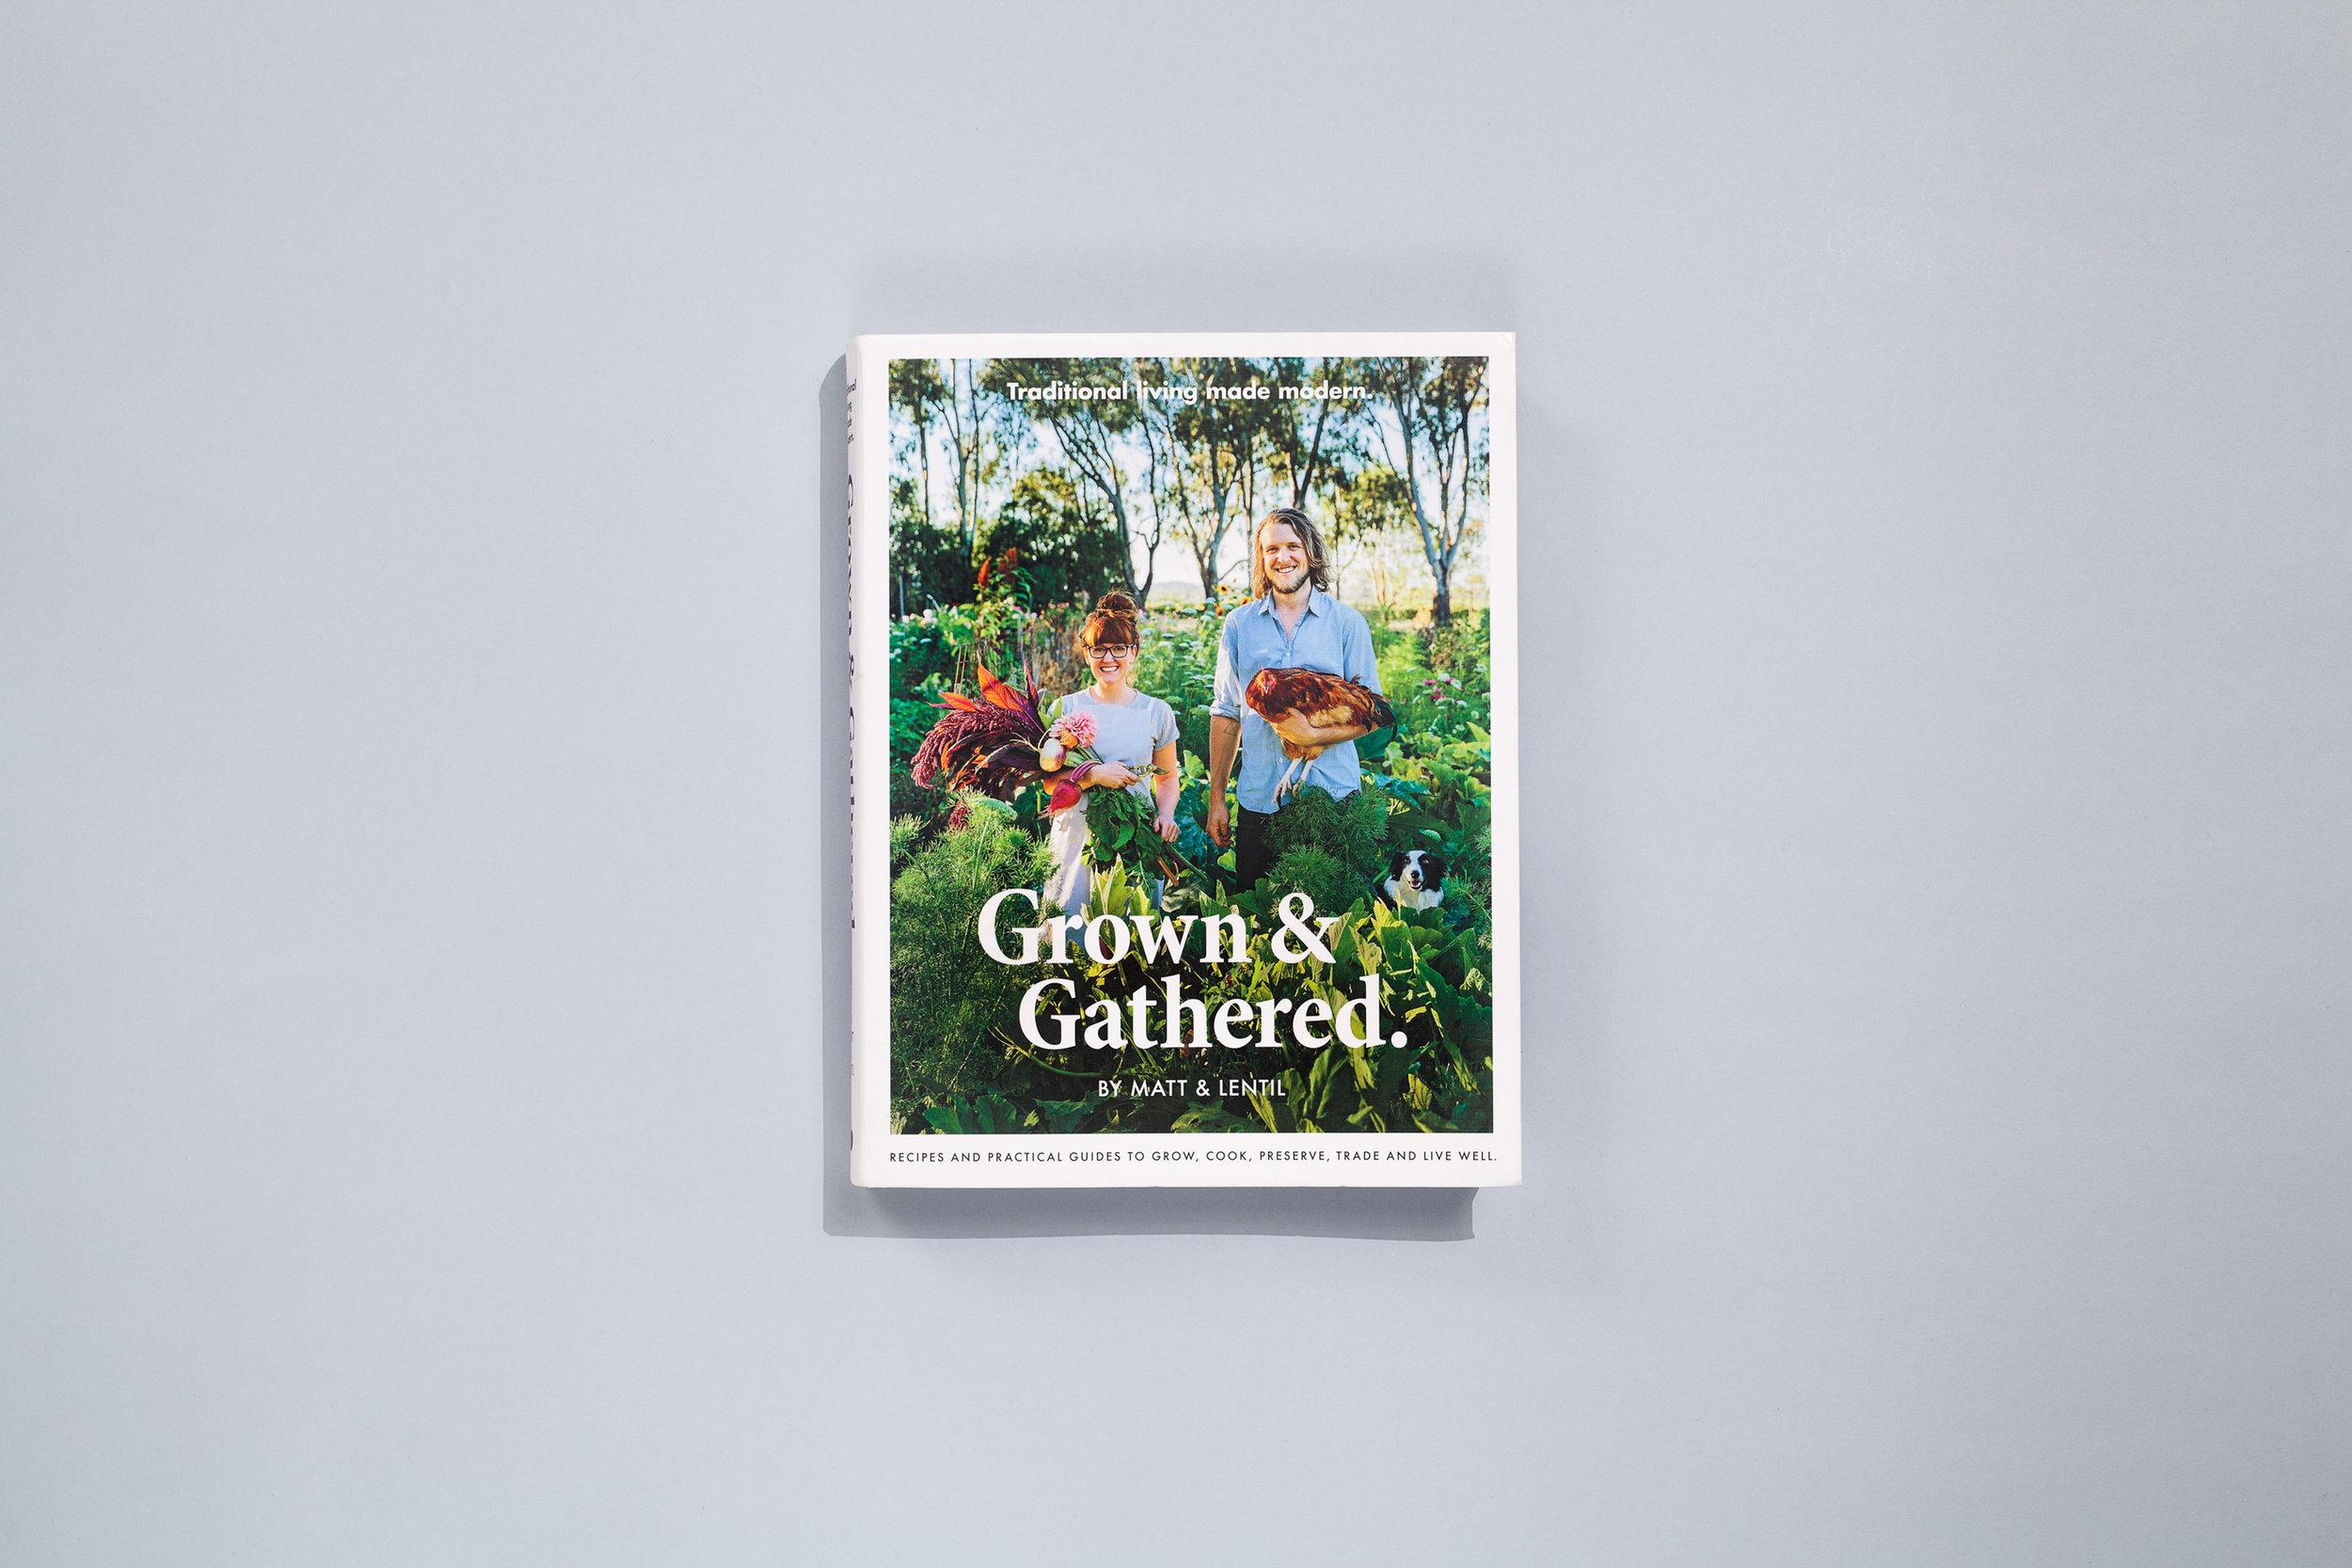 Title – Grown & Gathered Authors – Matt & Lentil Designer – Daniel New Photographer – Shantanu Starick Publisher – Plum  2017 Australian Book Design Awards + Best Designed Cookbook